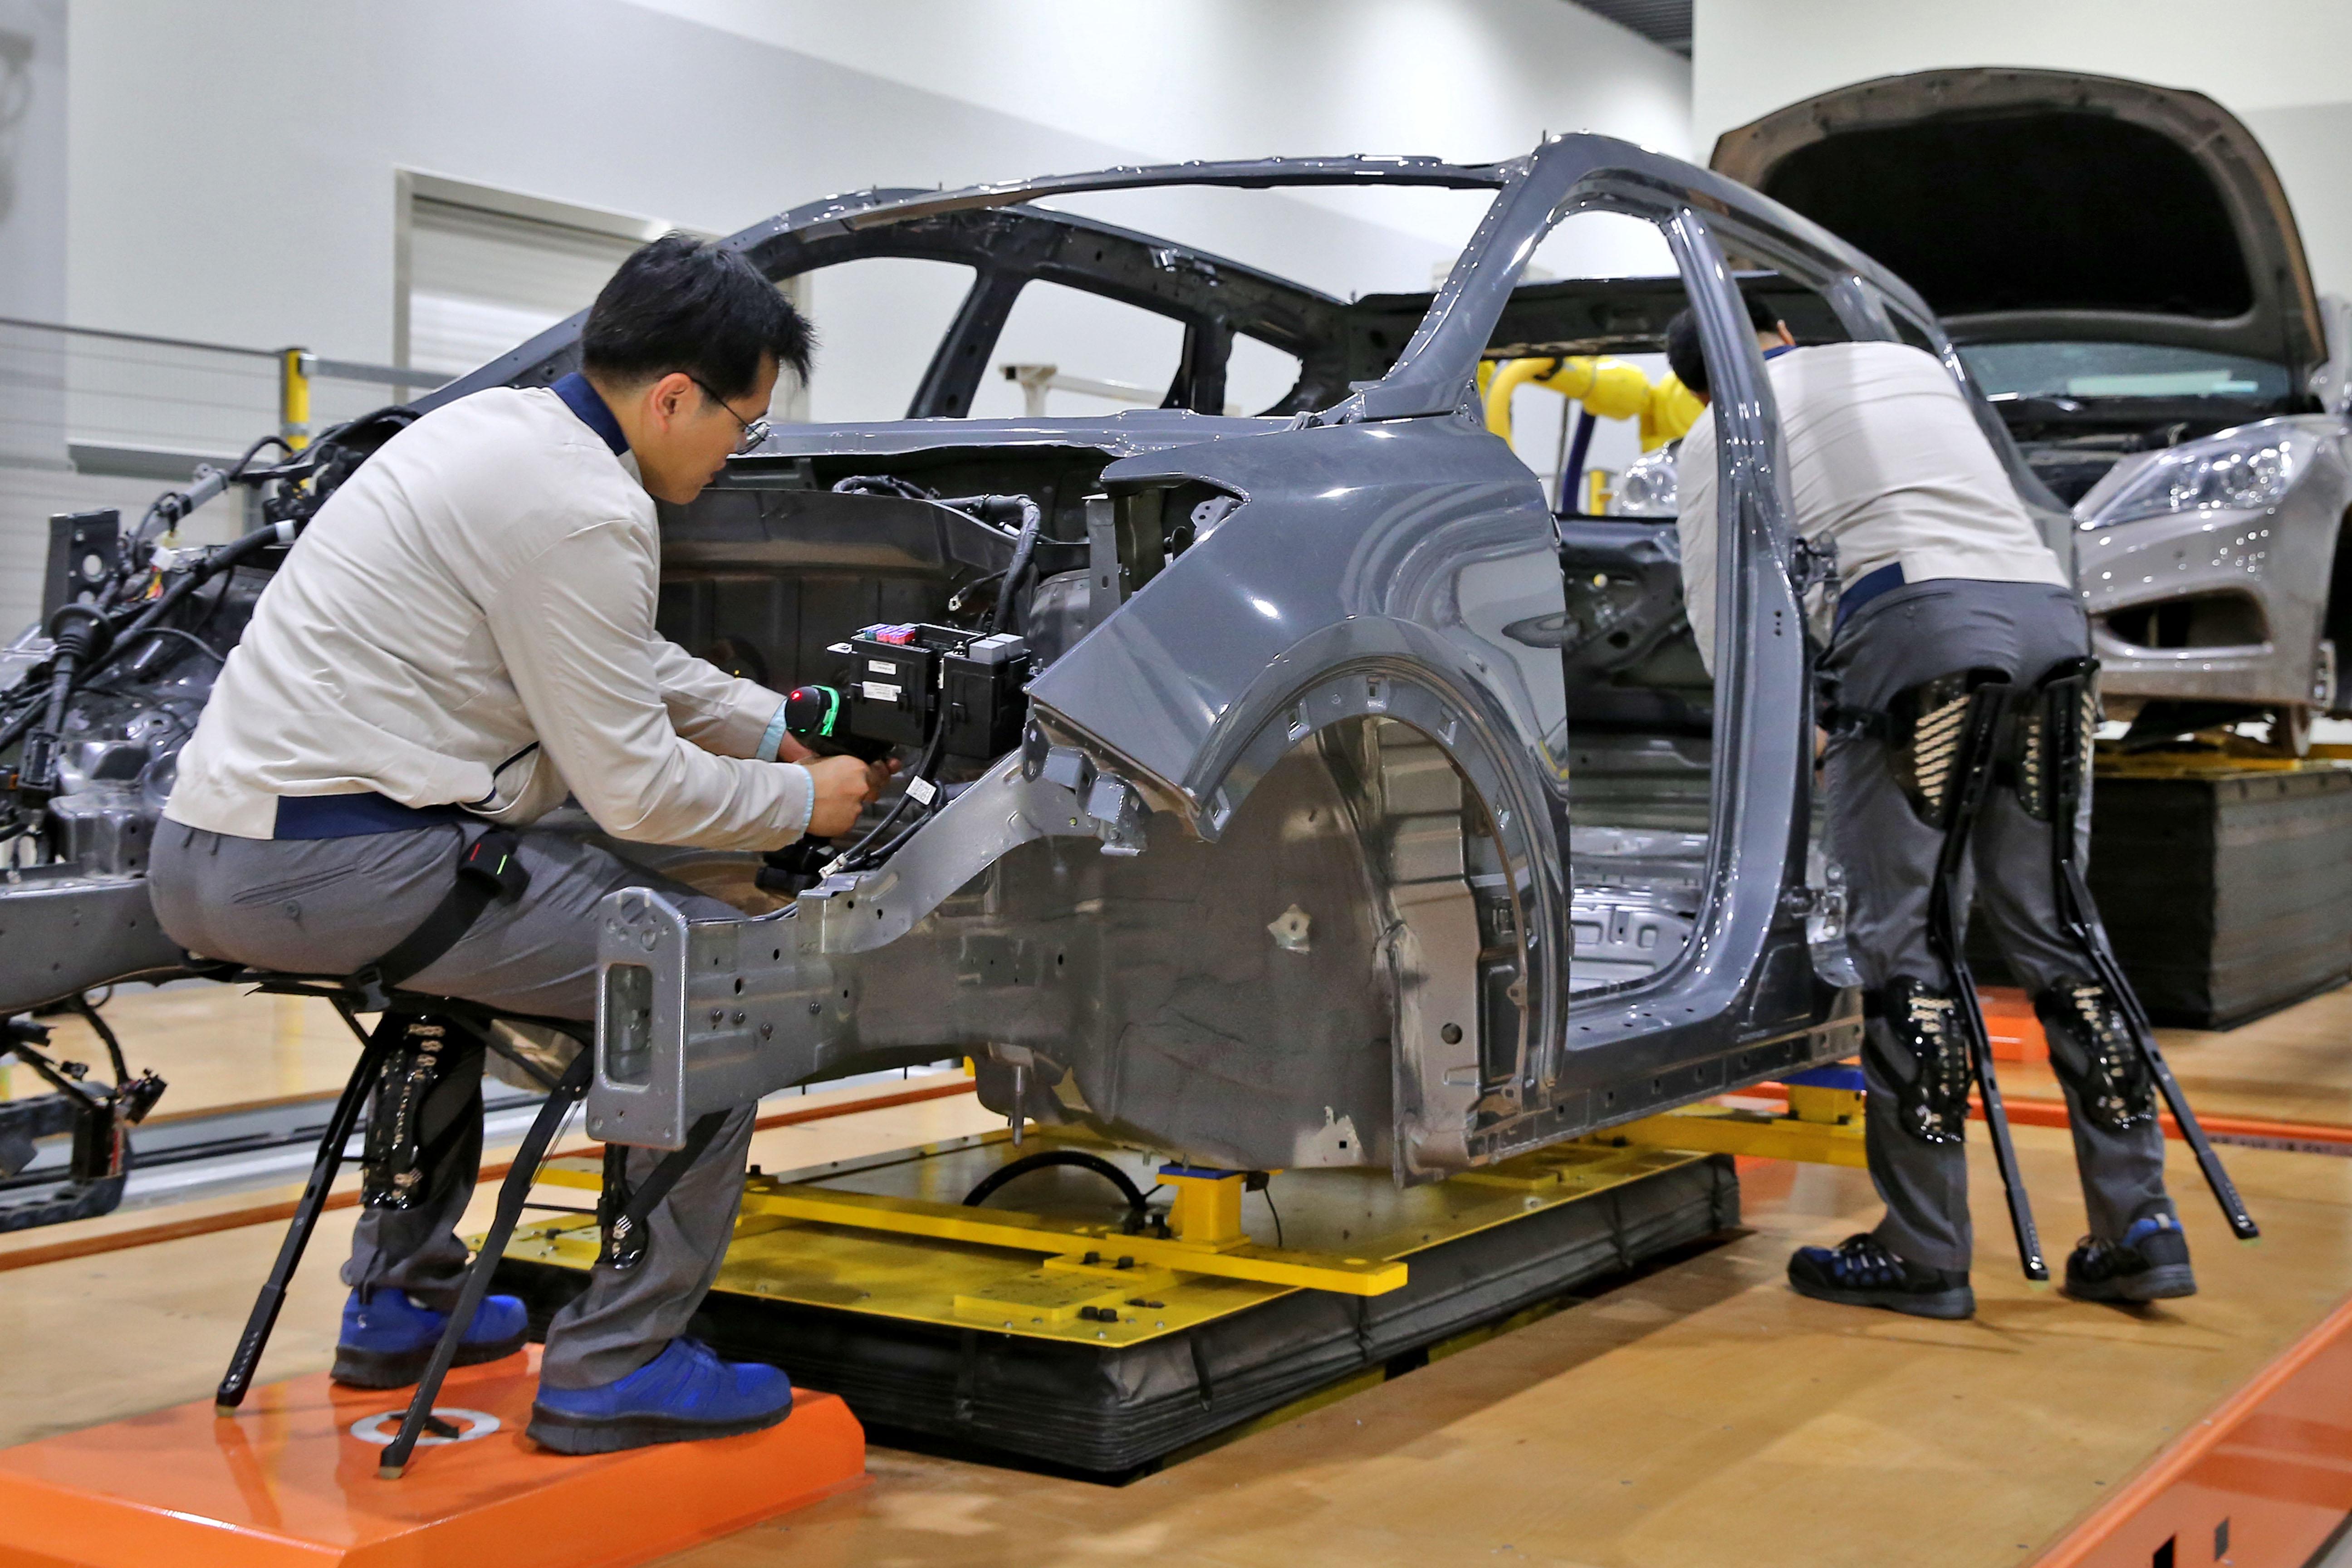 Hyundai_exoskeletons_0004